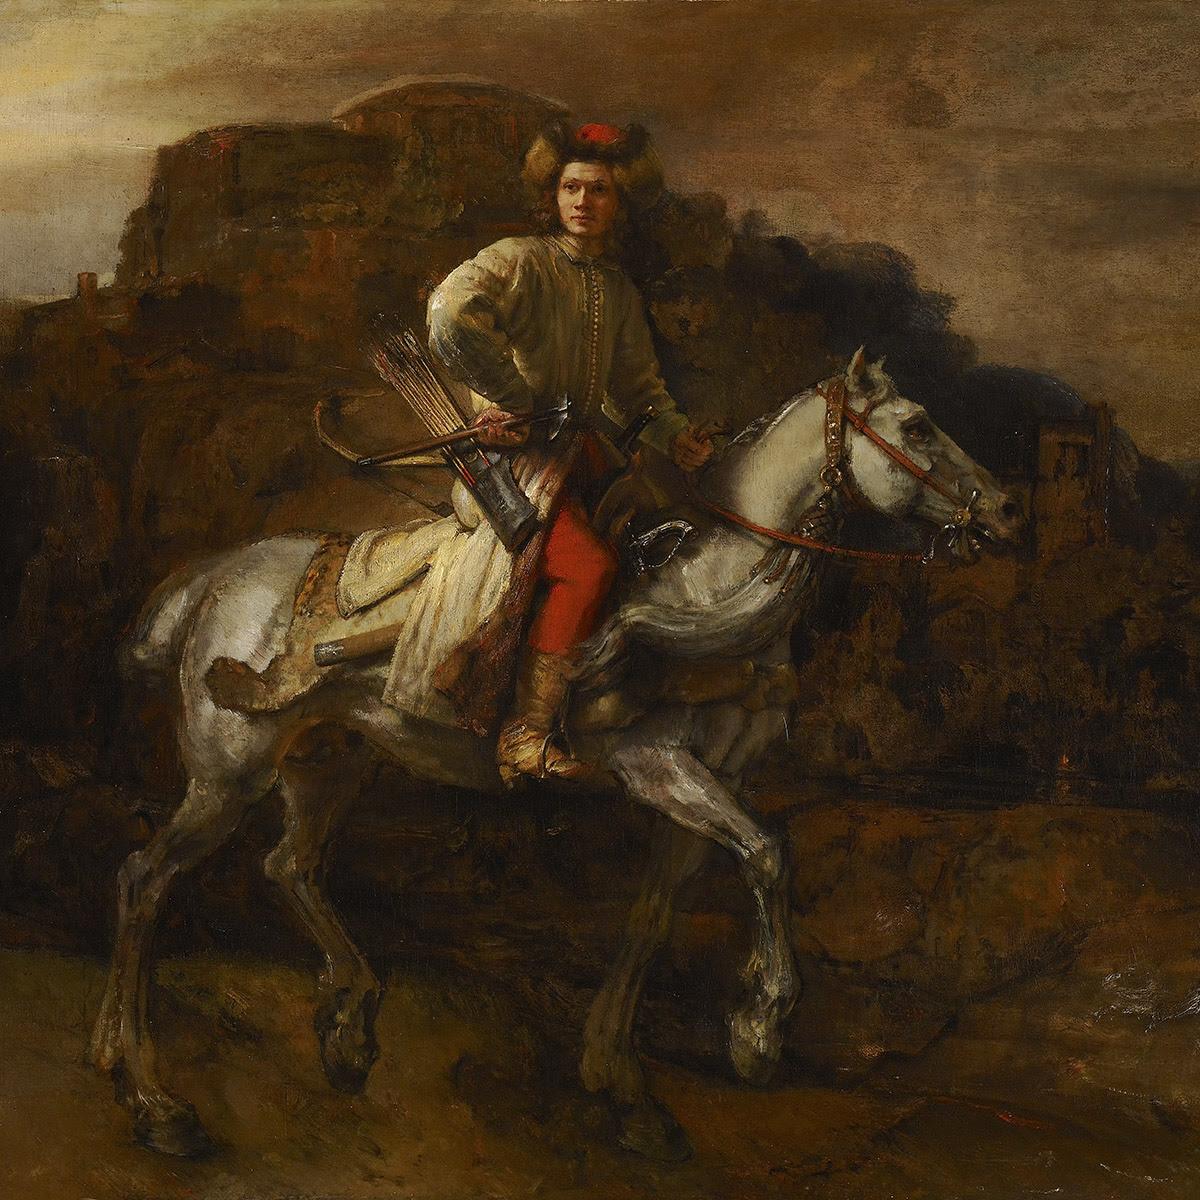 The Polish Rider by Rembrandt van Rijn